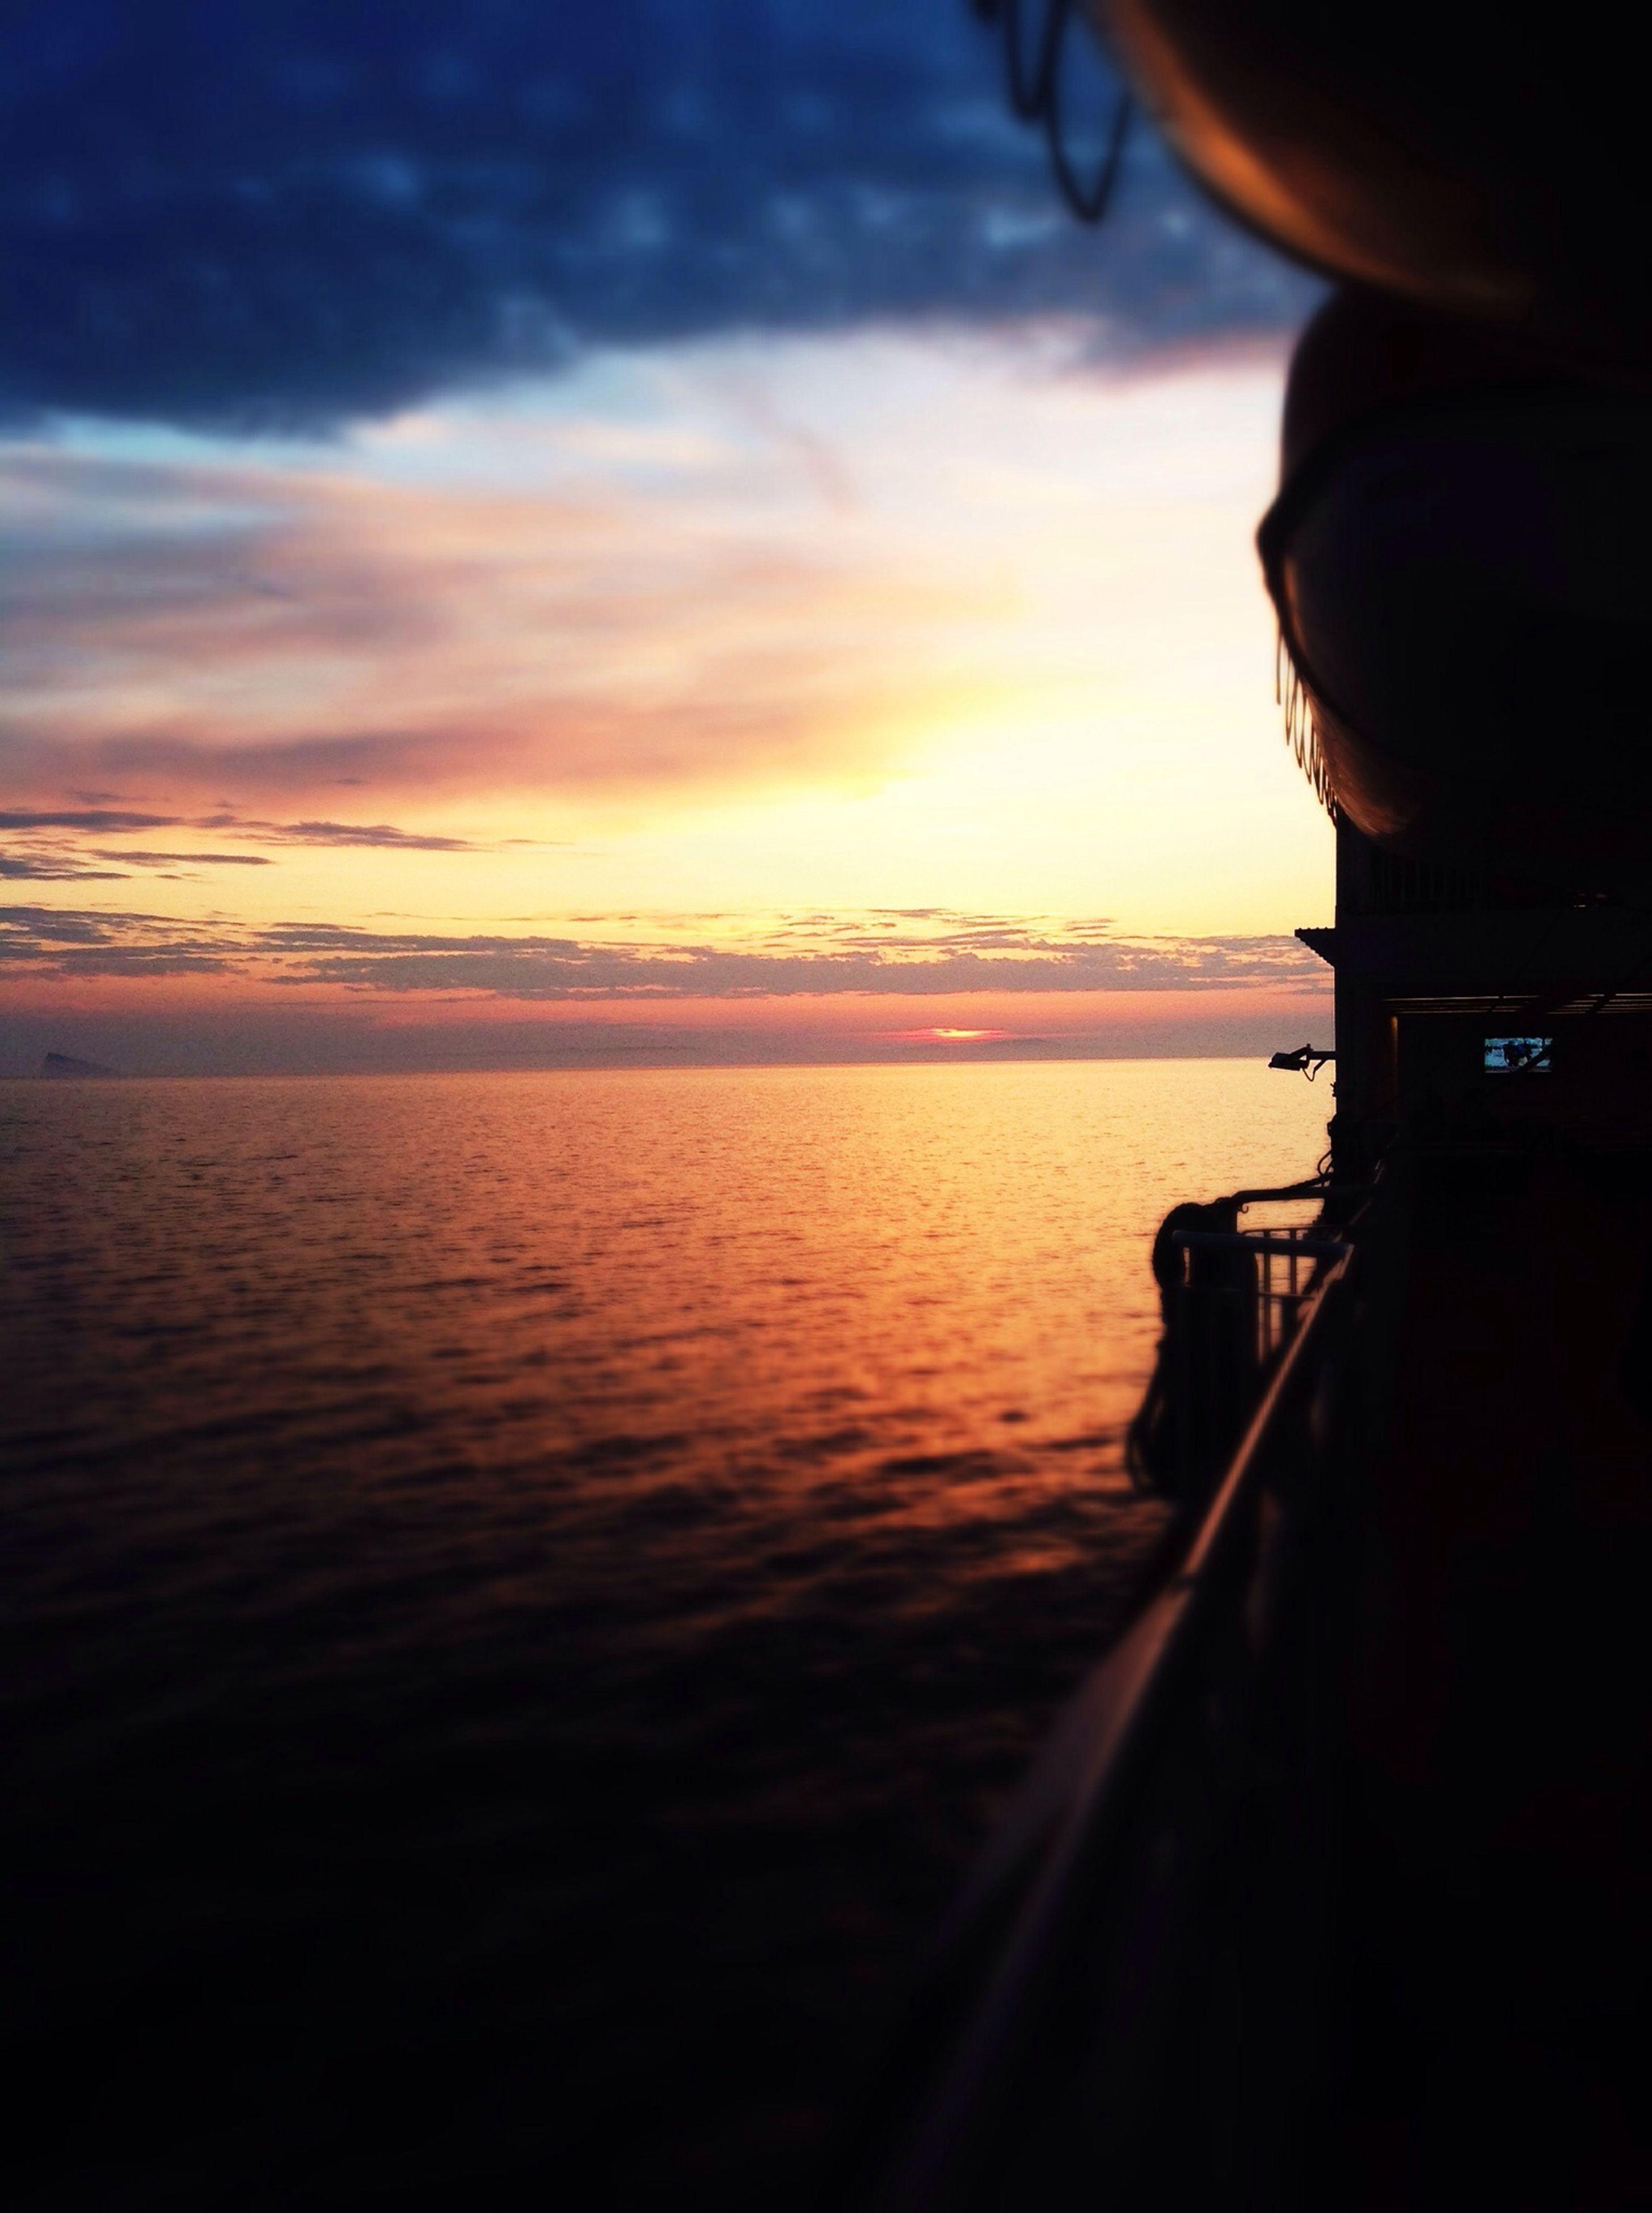 sunset, water, sky, sea, scenics, silhouette, beauty in nature, tranquil scene, orange color, horizon over water, tranquility, cloud - sky, nature, cloud, idyllic, reflection, transportation, rippled, dusk, dramatic sky